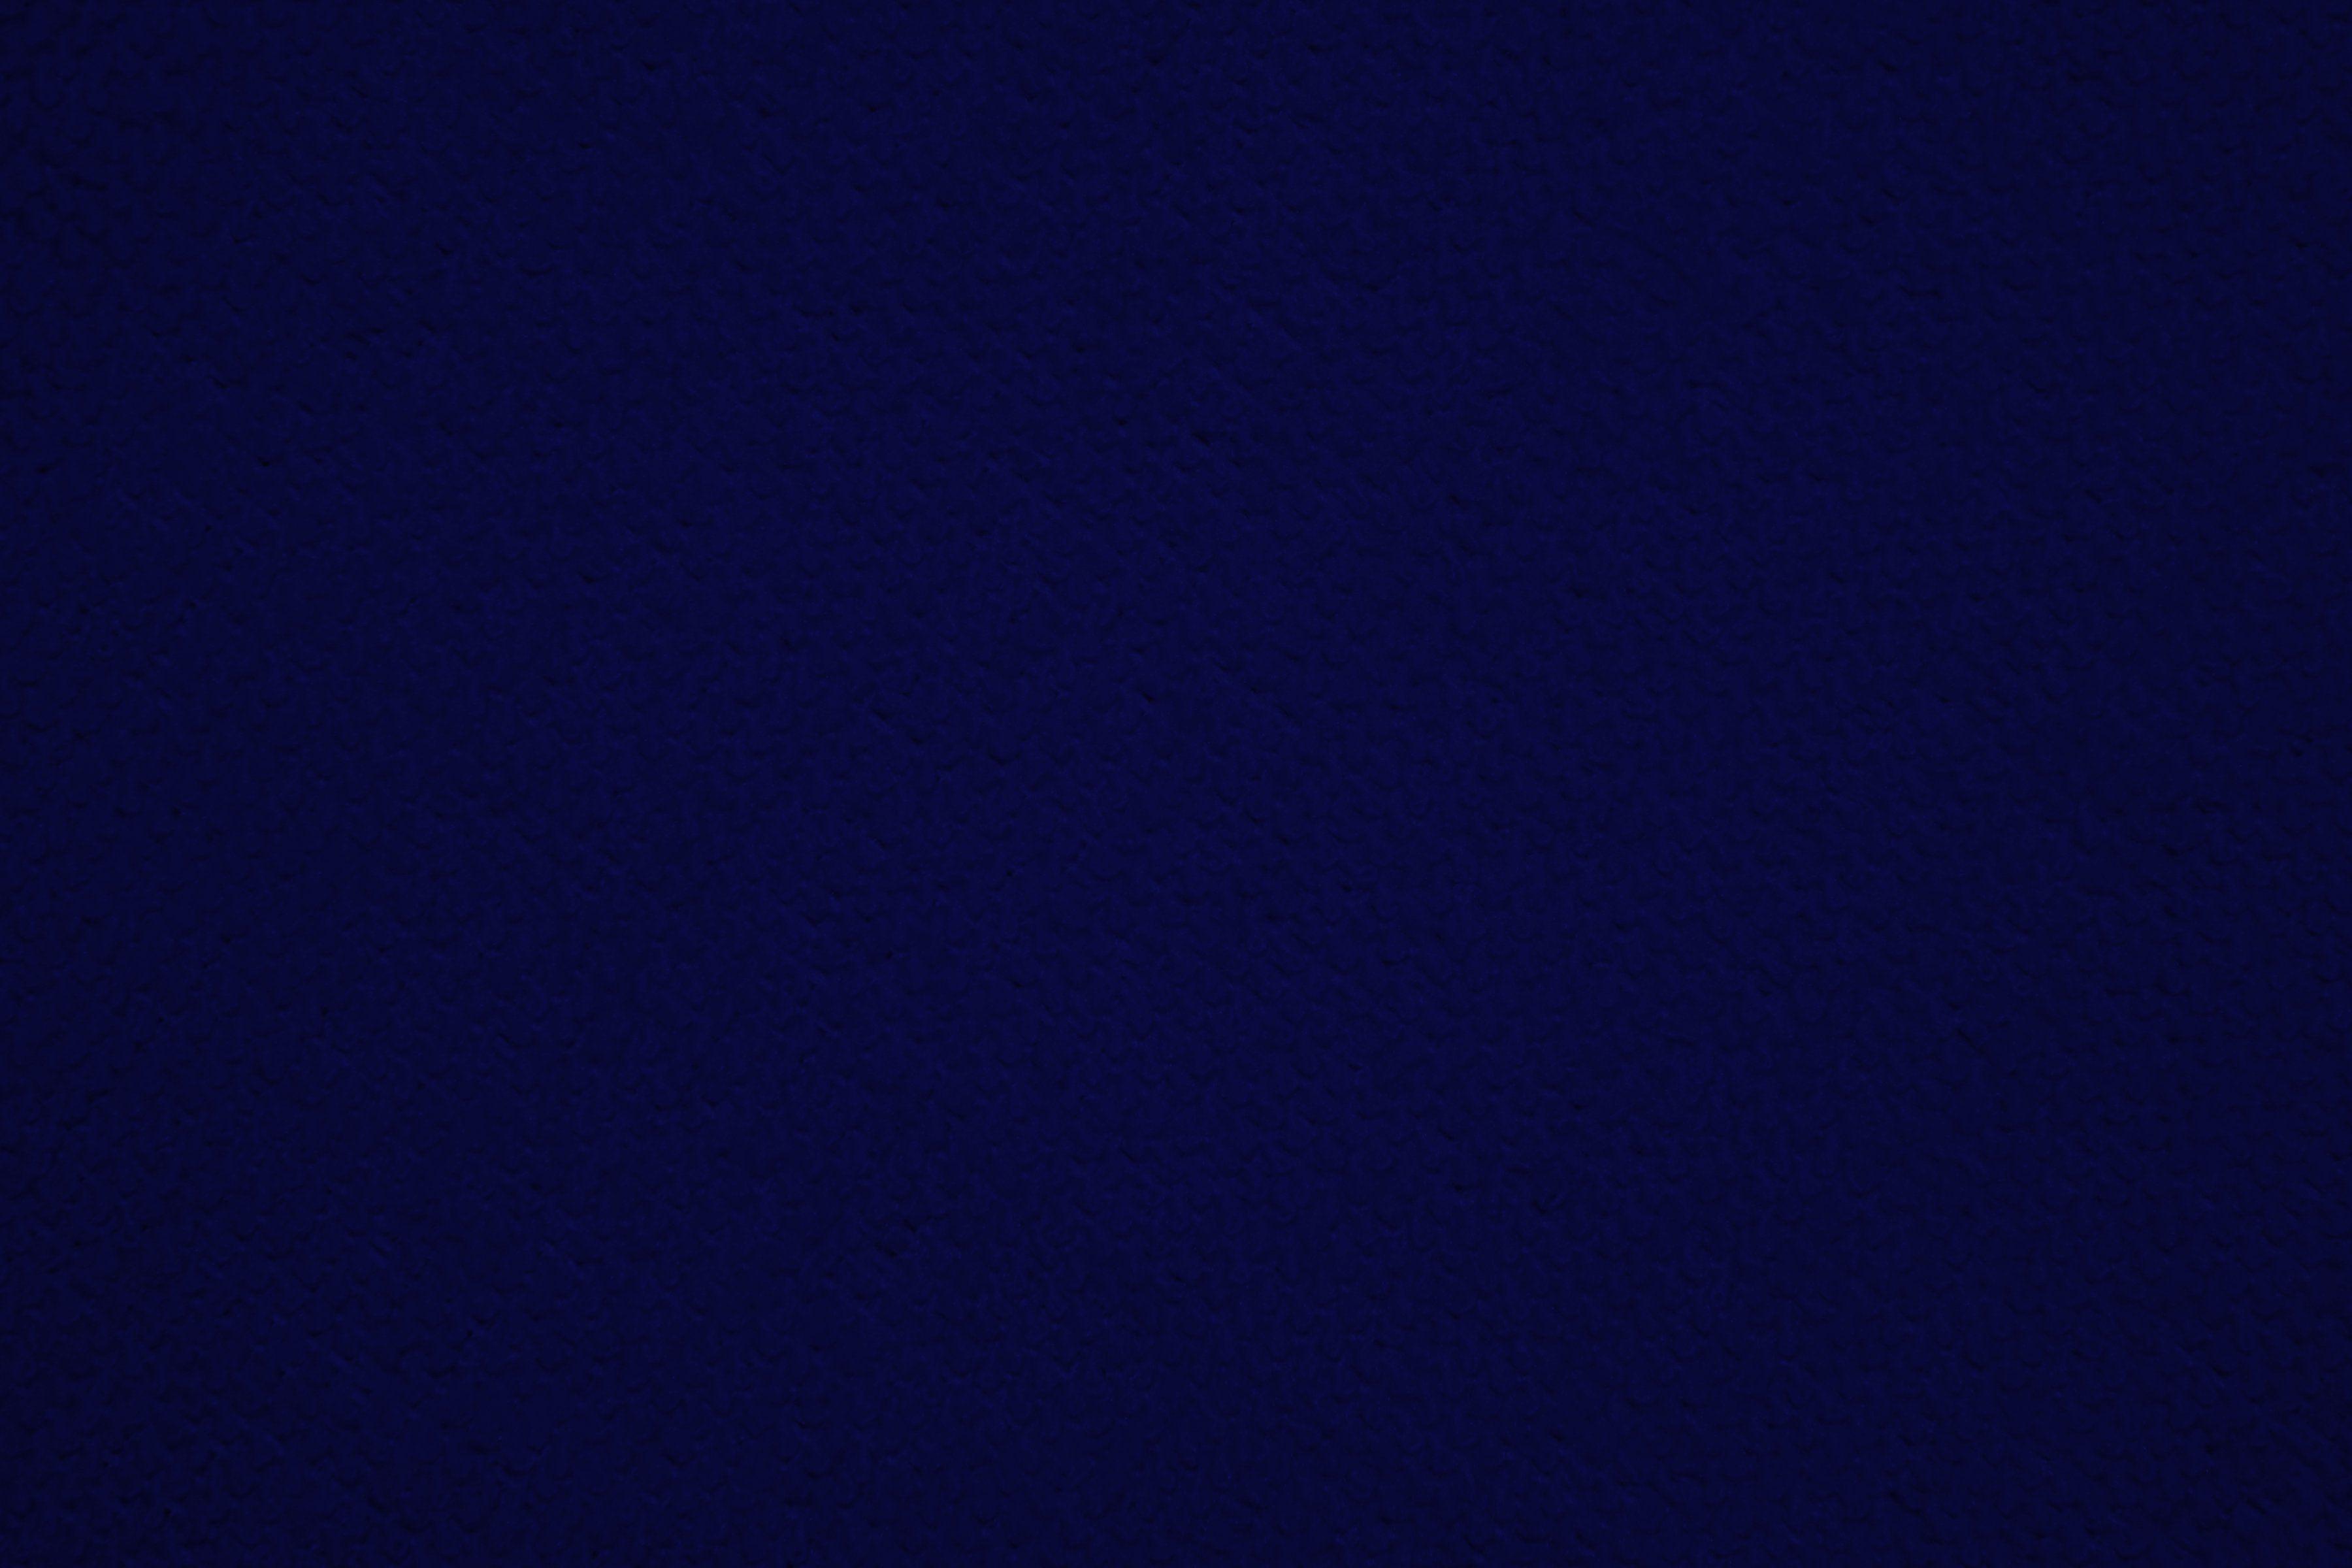 Navy Blue And Gold Wallpaper  Wallpapersafari. Kitchen Collection Printable Coupons. Sandgate Hotel Kitchen Nightmares. Semi Flush Kitchen Lighting. Mavericks Southern Kitchen. Giagni Kitchen Faucet. White Kitchen Bar Stools. The Cooks Kitchen. Hells Kitchen Results